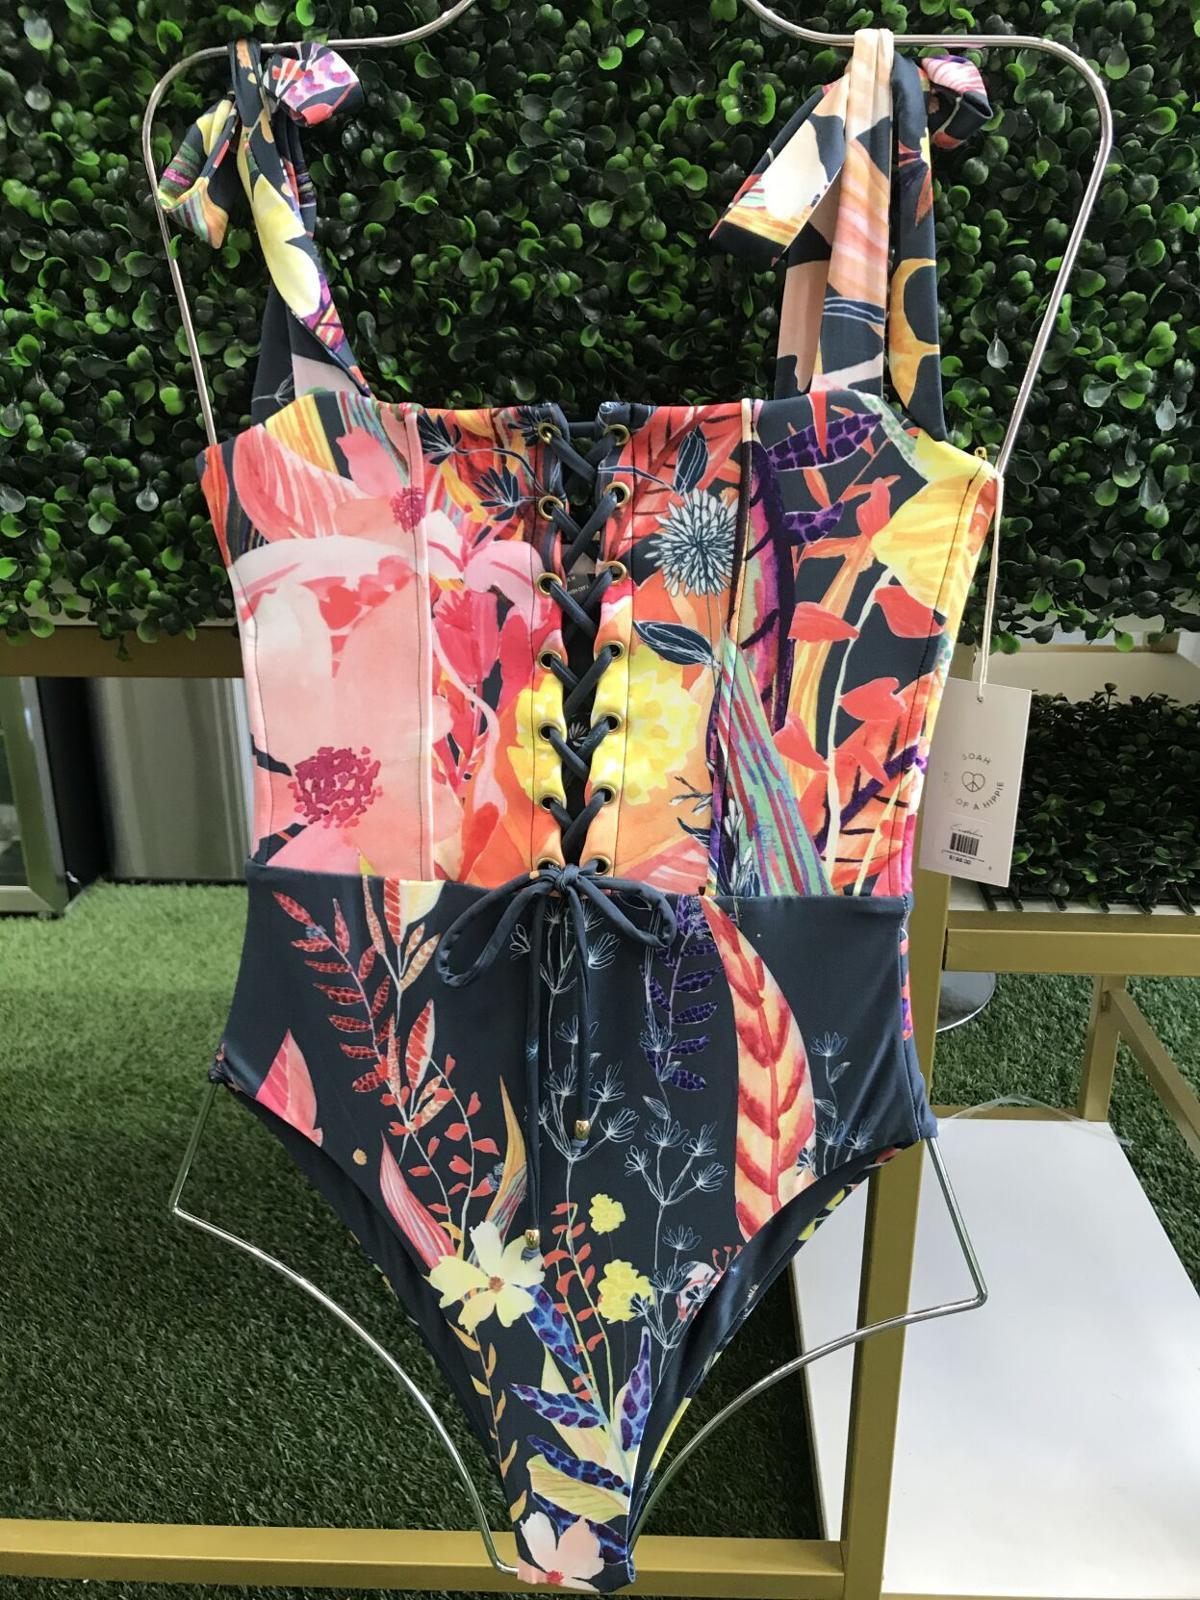 Floral one-piece bathing suit by SOAH – Soul of a Hippie Swimwear